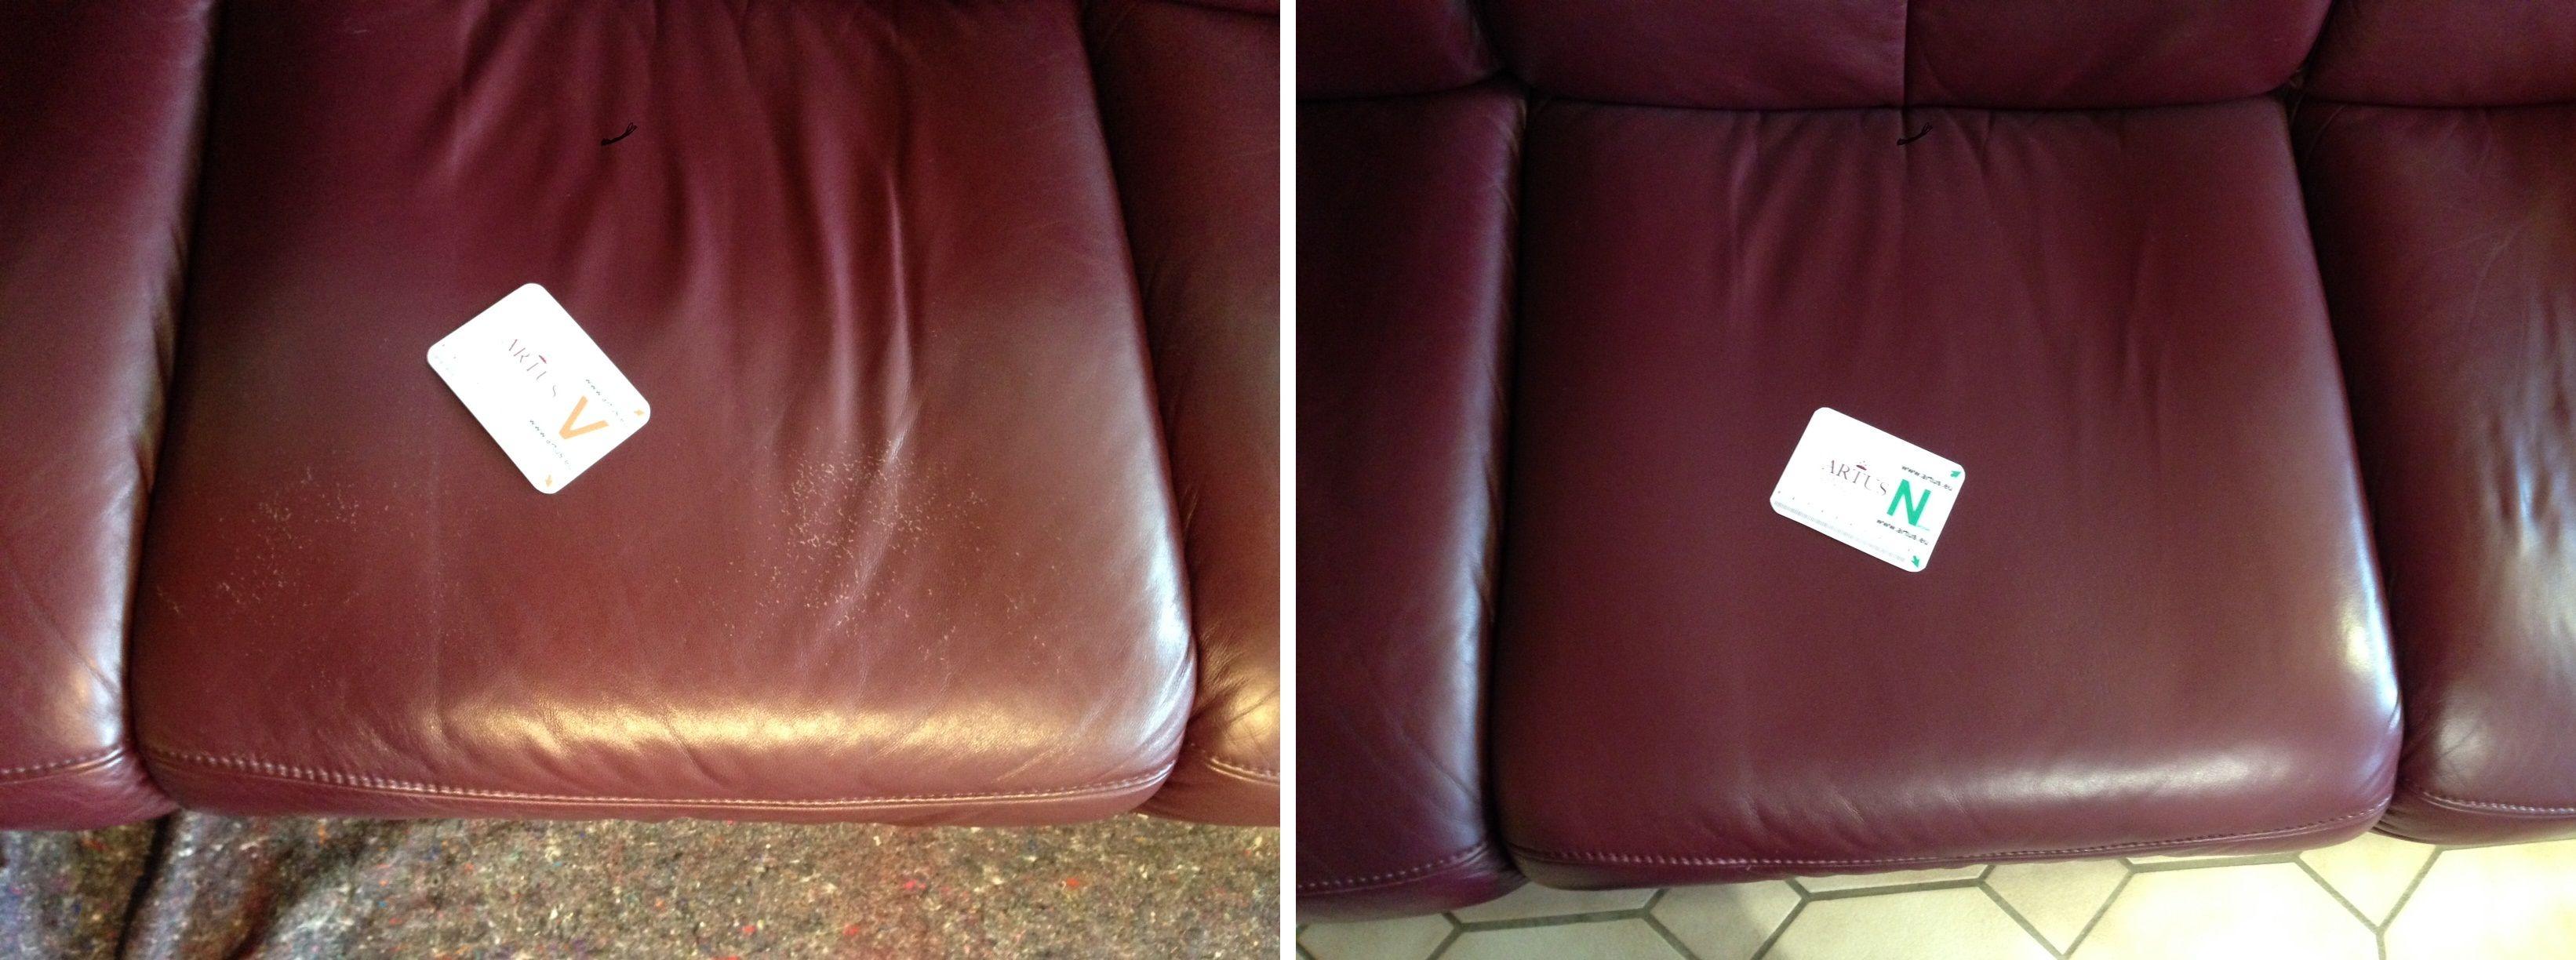 abnutzung instandsetzung reparatur beschaedigung. Black Bedroom Furniture Sets. Home Design Ideas